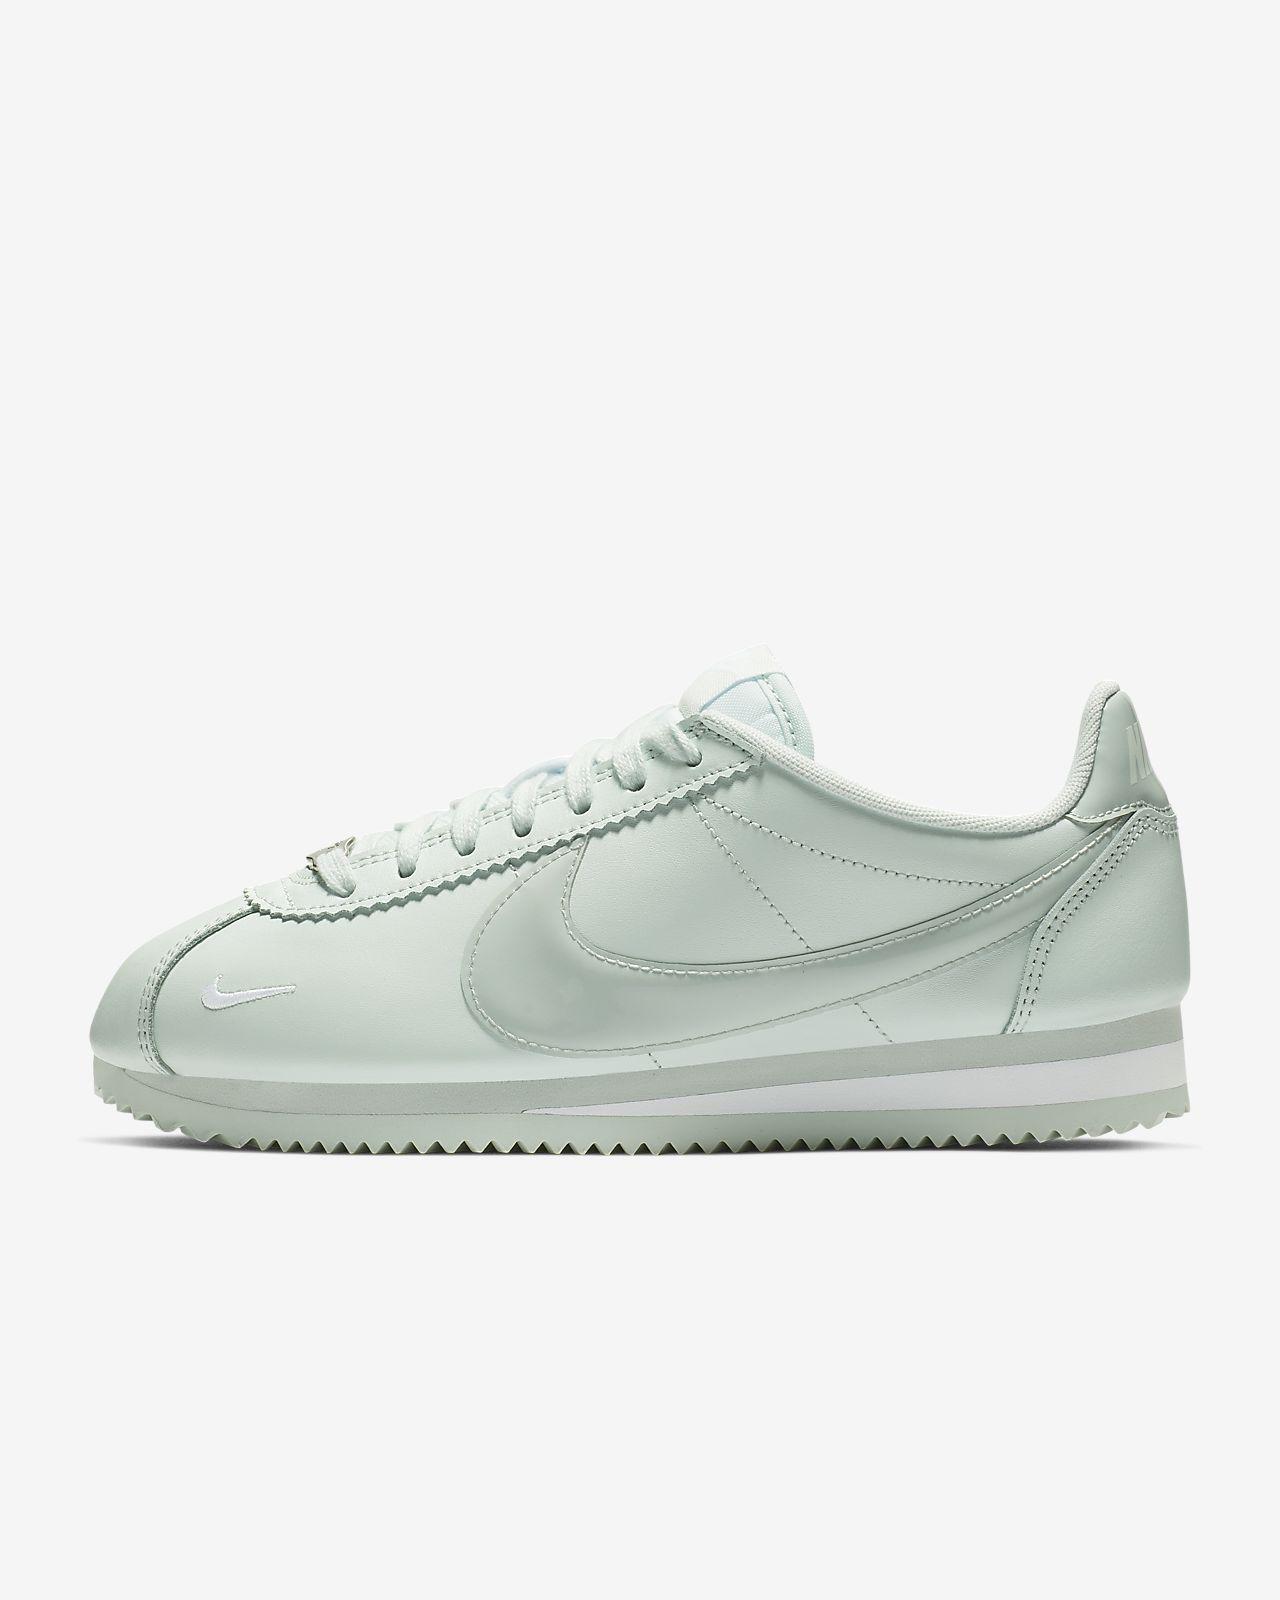 watch ad174 ec516 Women s Shoe. Nike Classic Cortez Premium